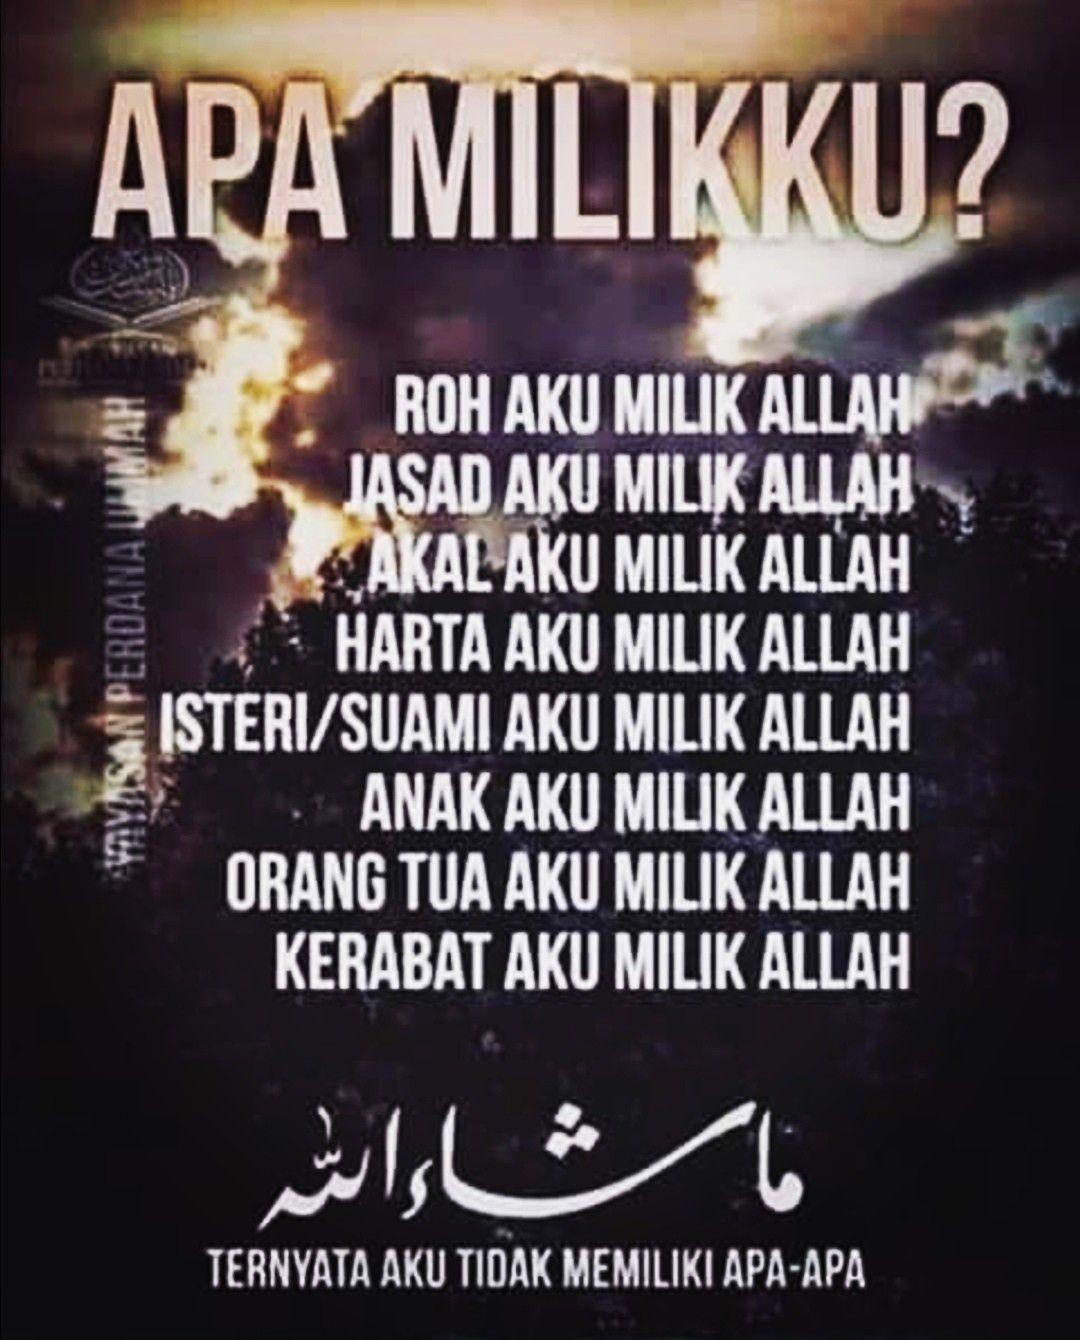 Pin Oleh Ardi Di Islam Kutipan Kutipan Inspiratif Kutipan Iman